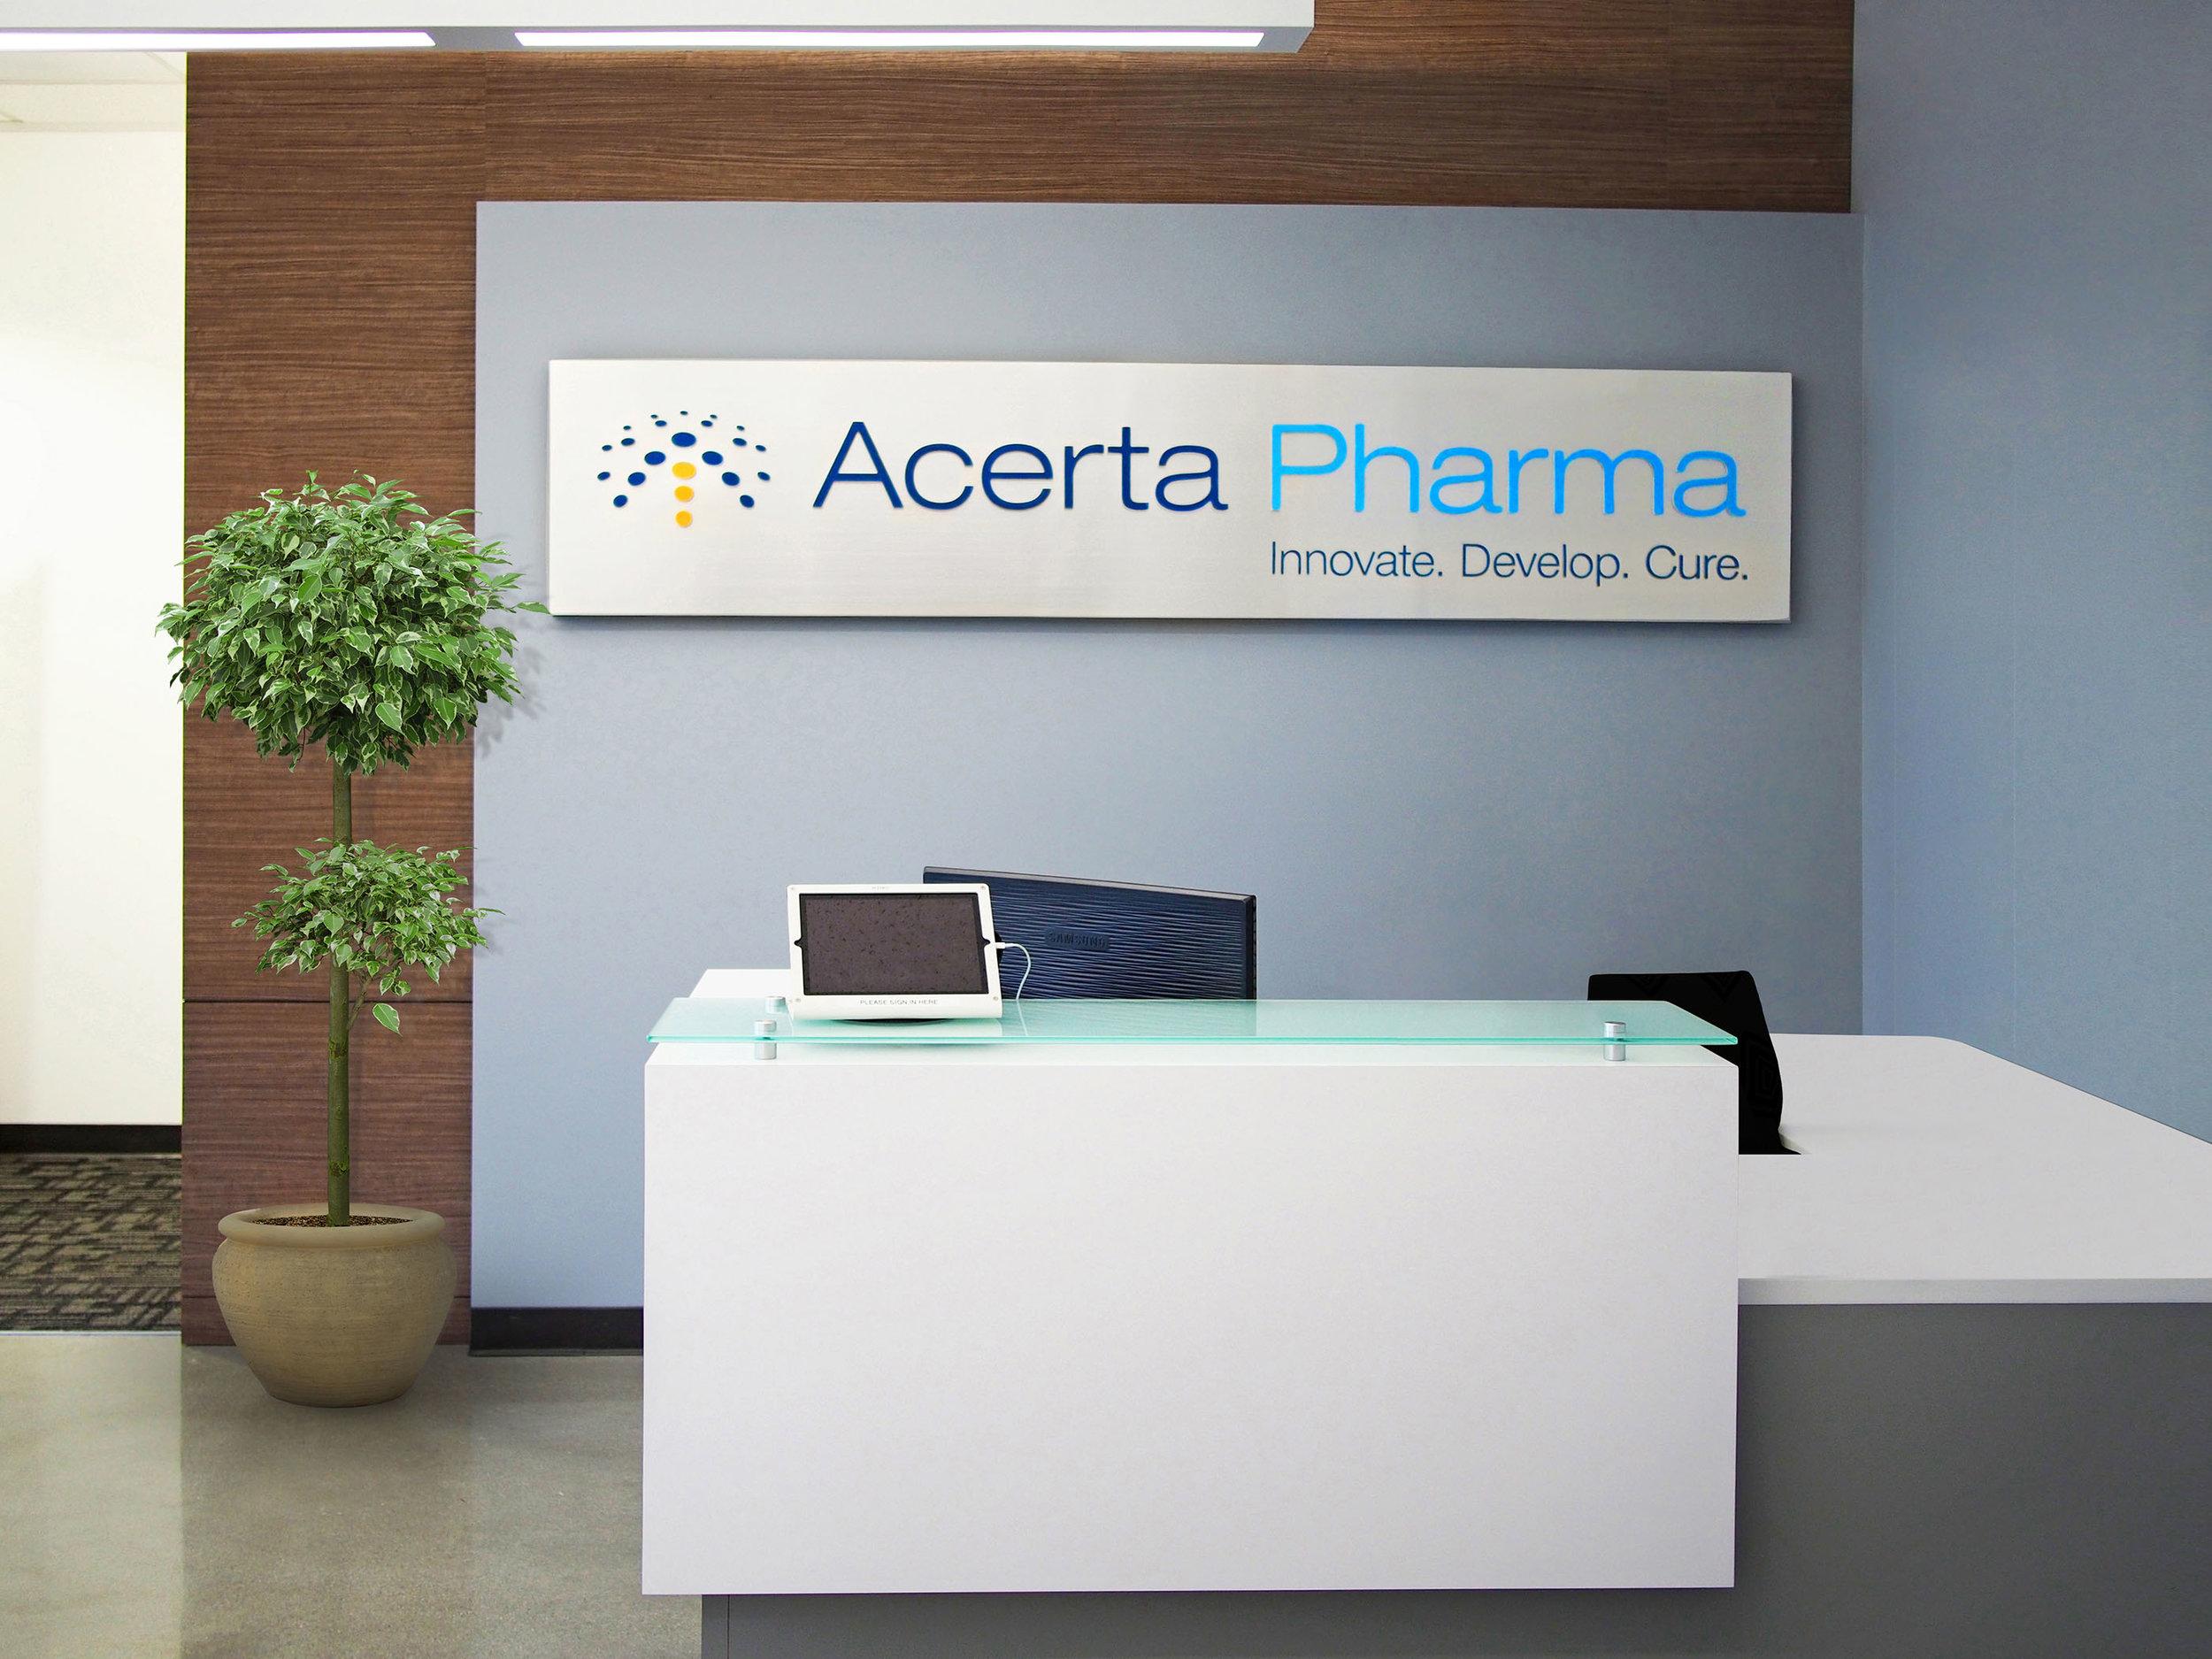 AcertaPharma 009 + plant.jpg